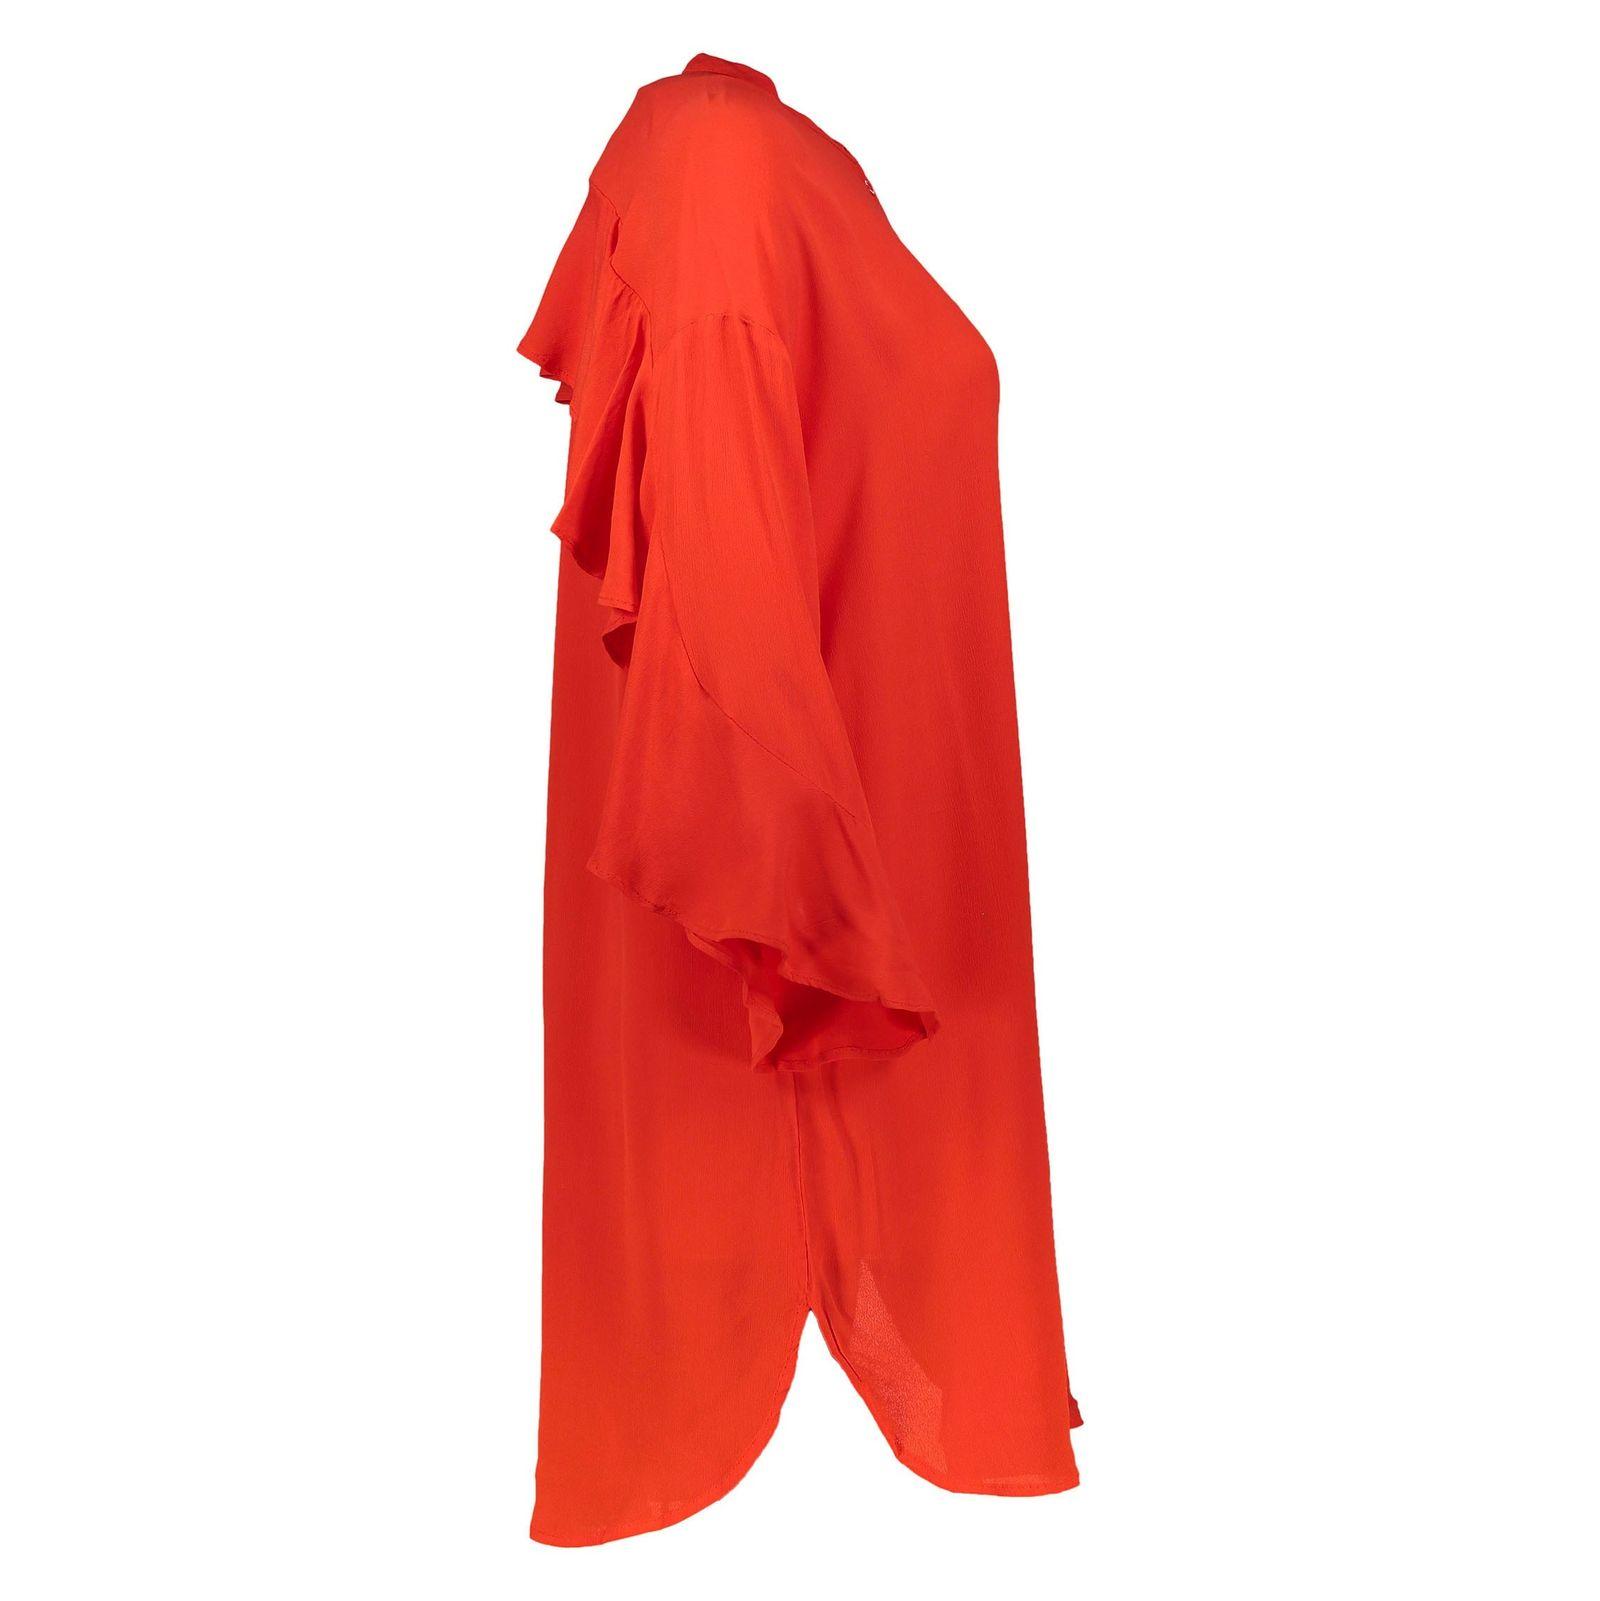 تونیک ویسکوز بلند زنانه - ورو مدا - قرمز - 3